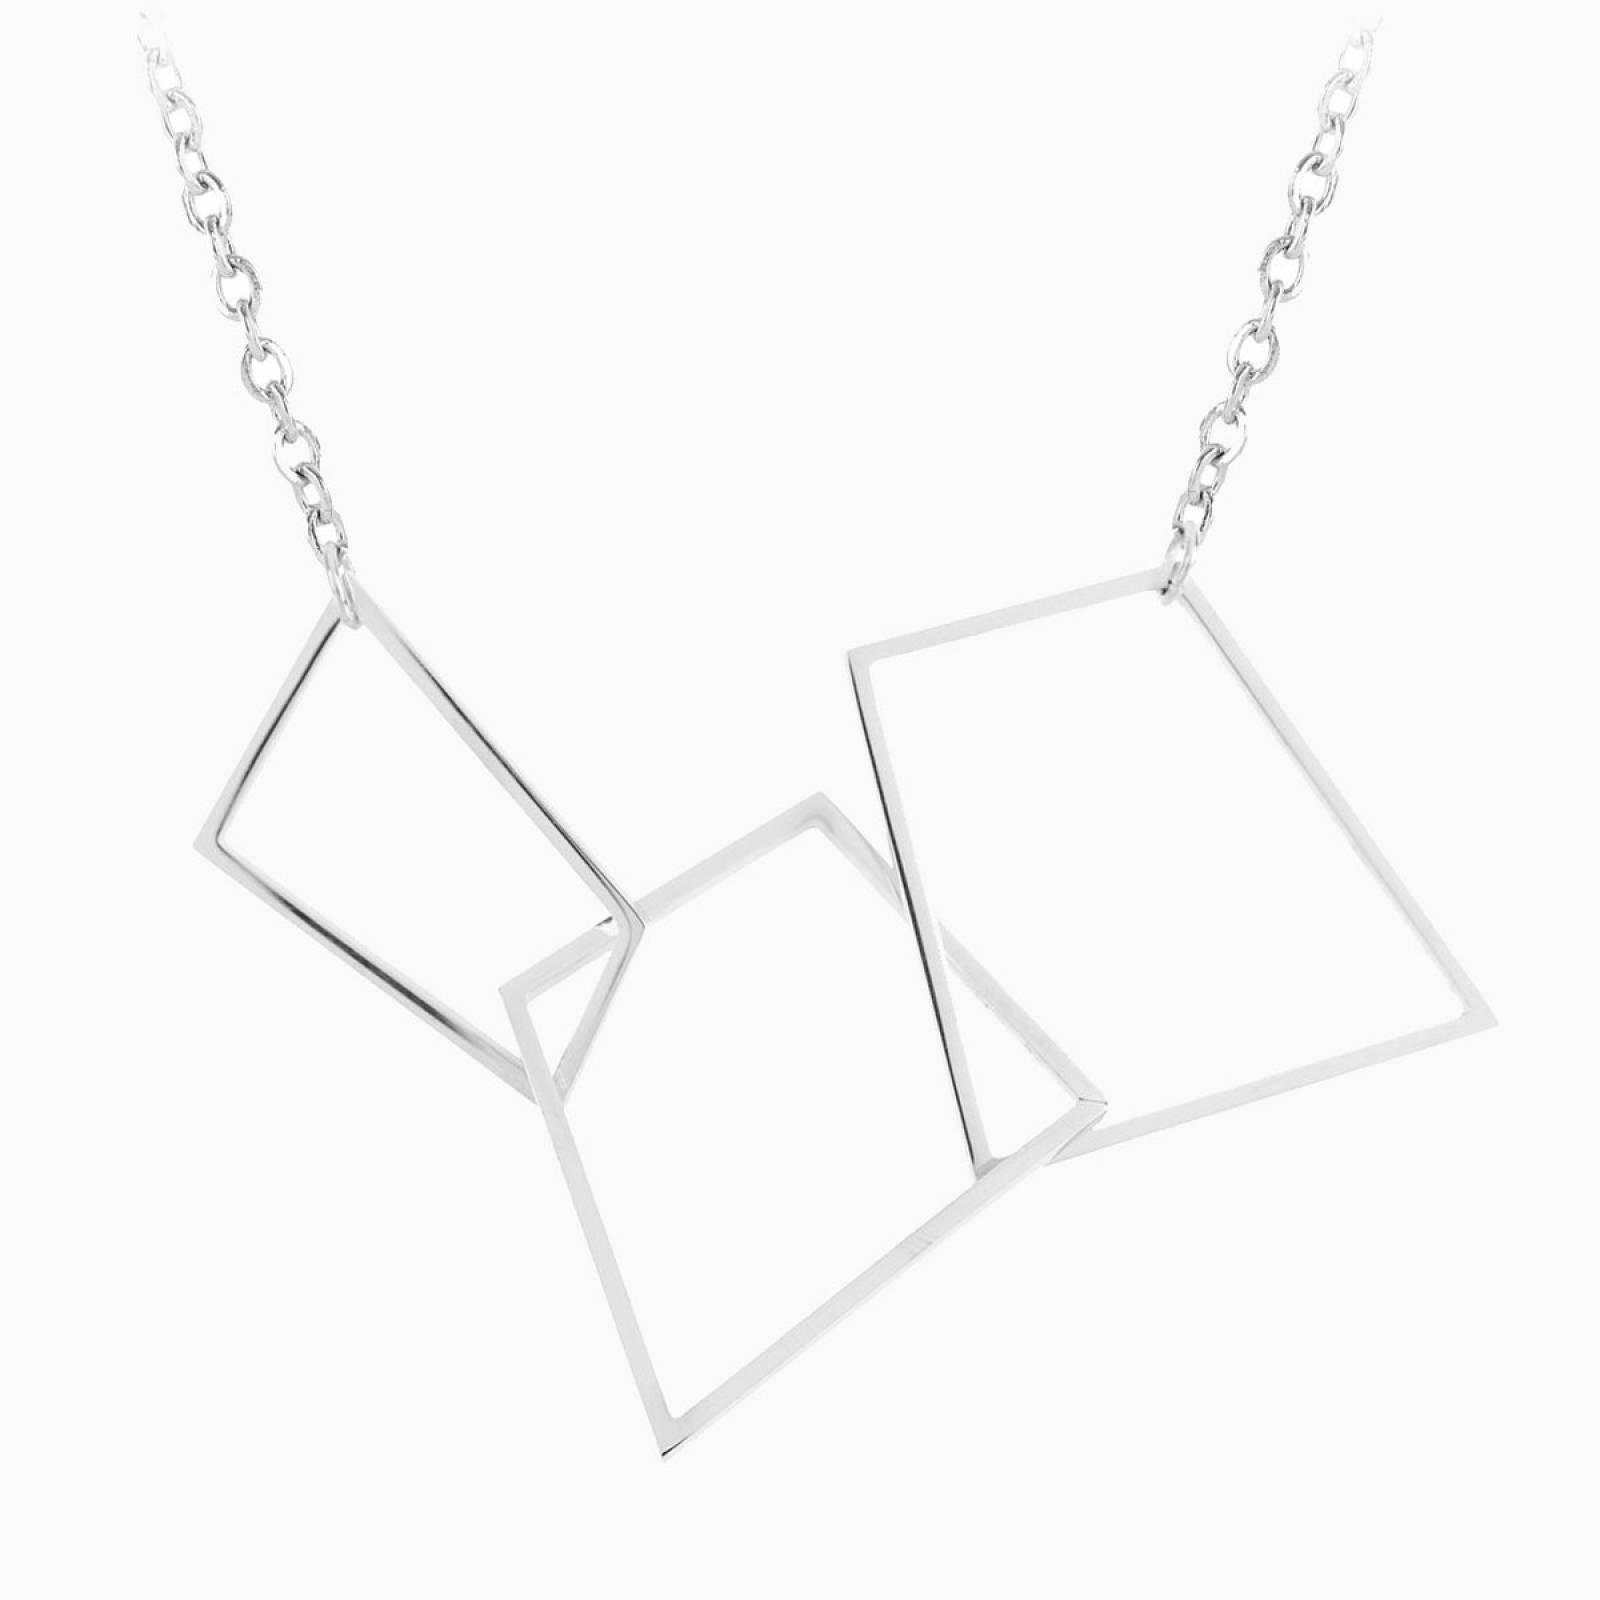 Hepworth Steel Necklace By Esa Evans